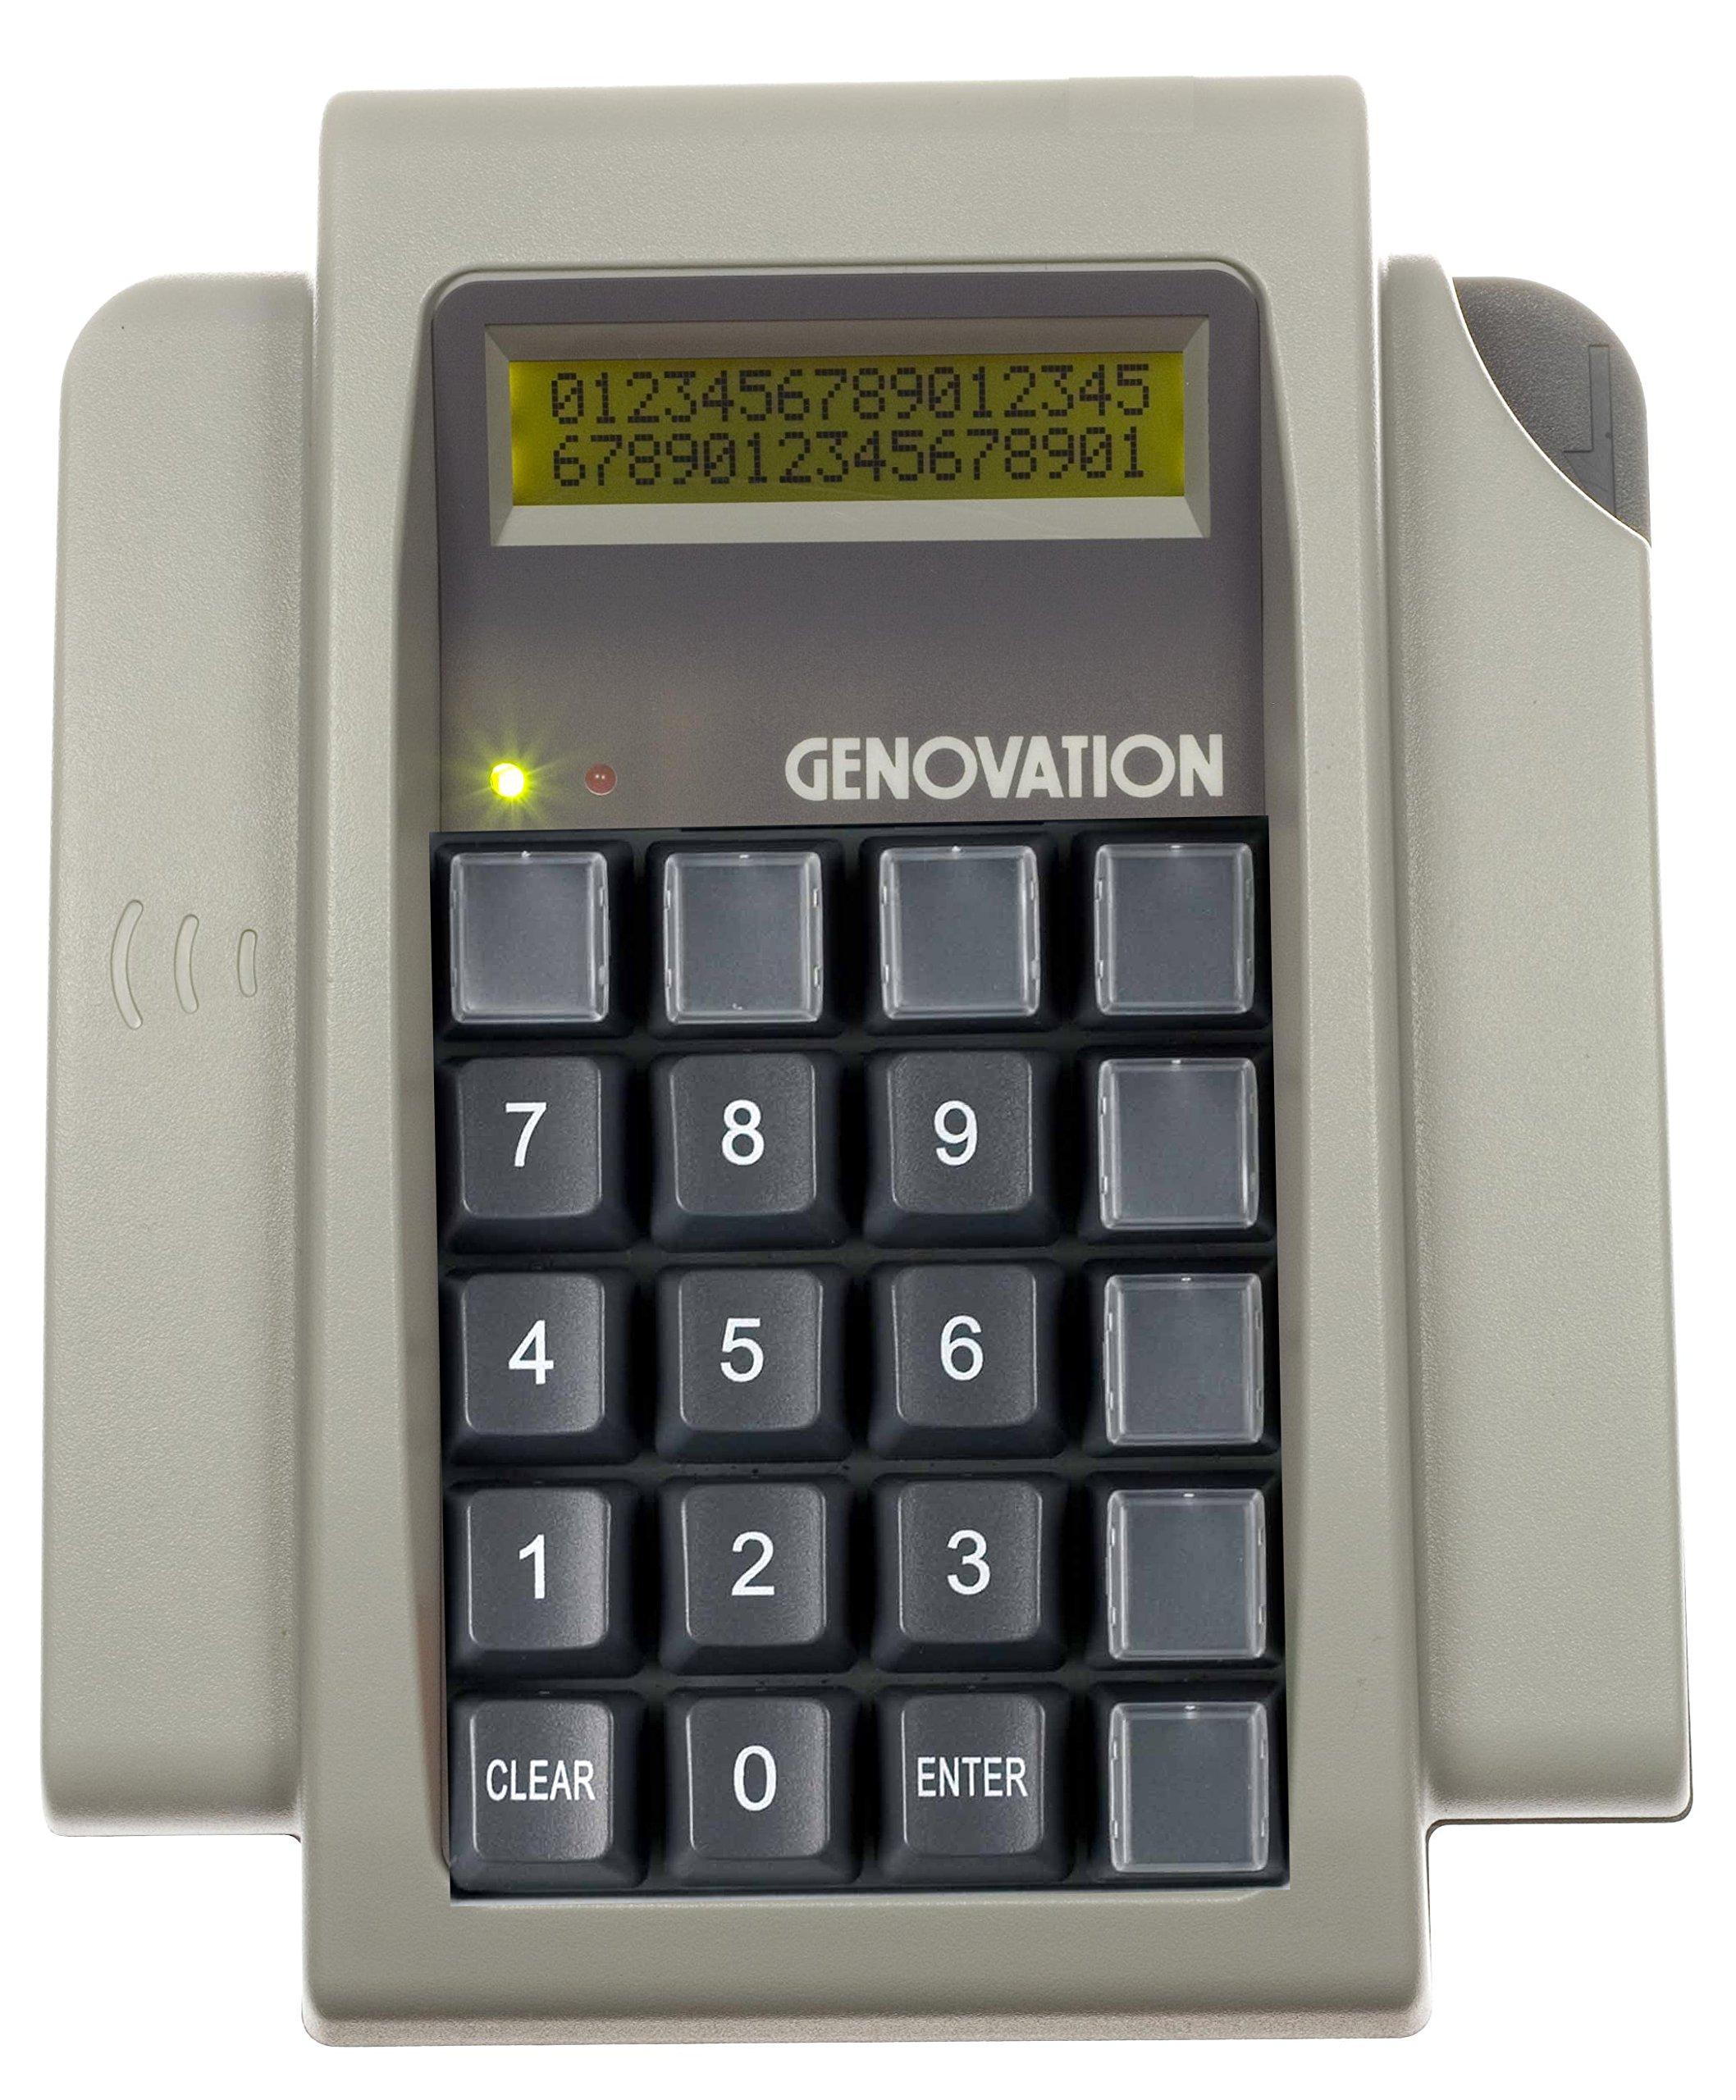 Genovation Mini Term 910: 20 Key Mechanical including 8 Relegendable Keys, 2 ines LCD USB